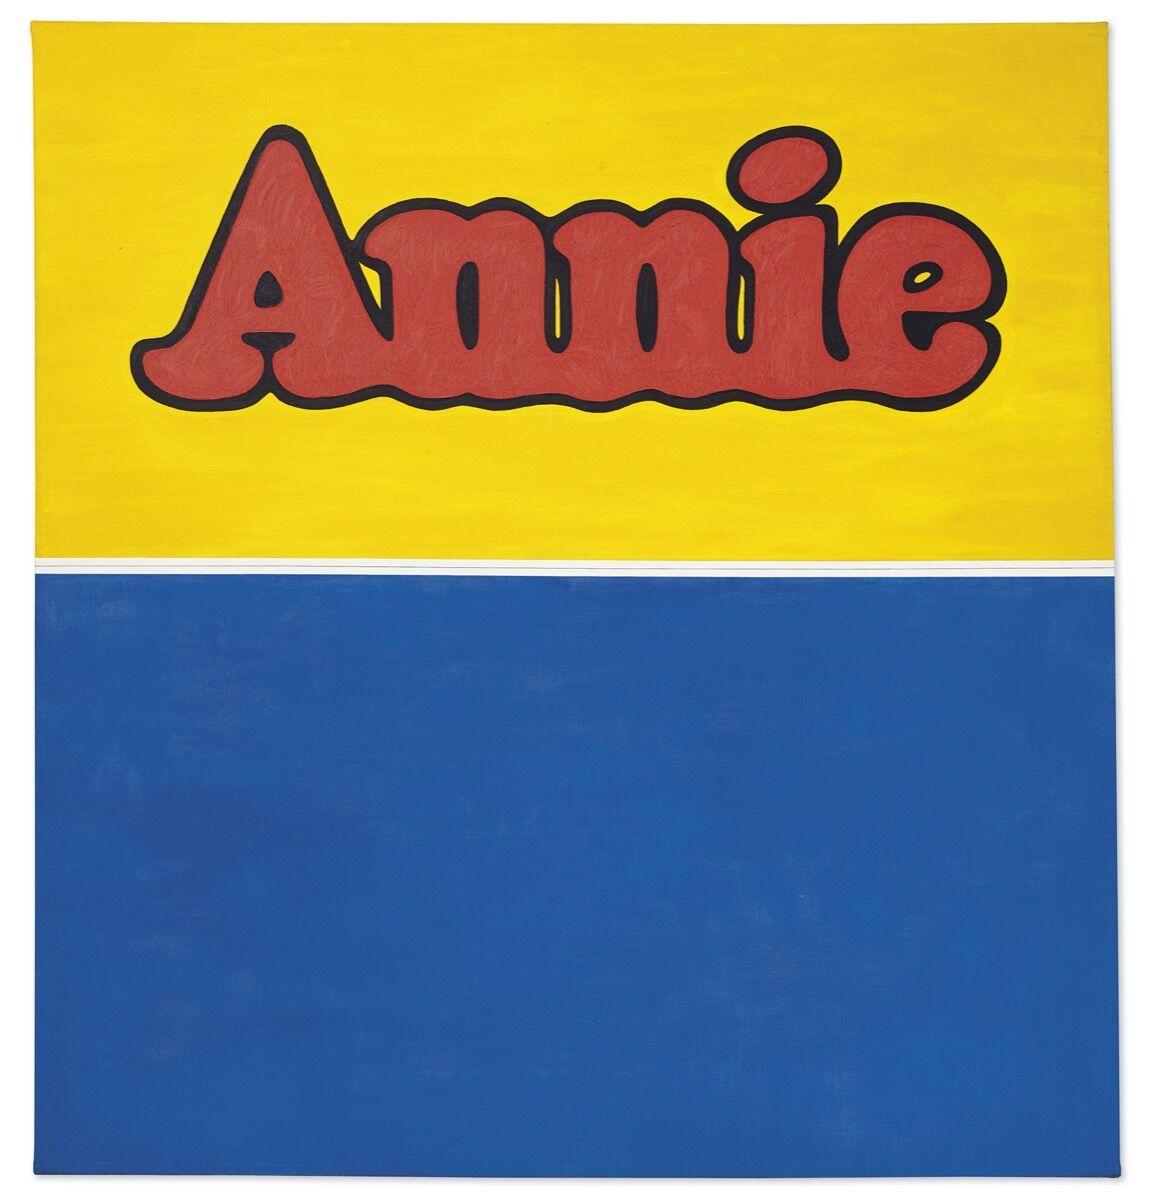 Ed Ruscha, Annie, 1962. Courtesy of Christie's Images Ltd.